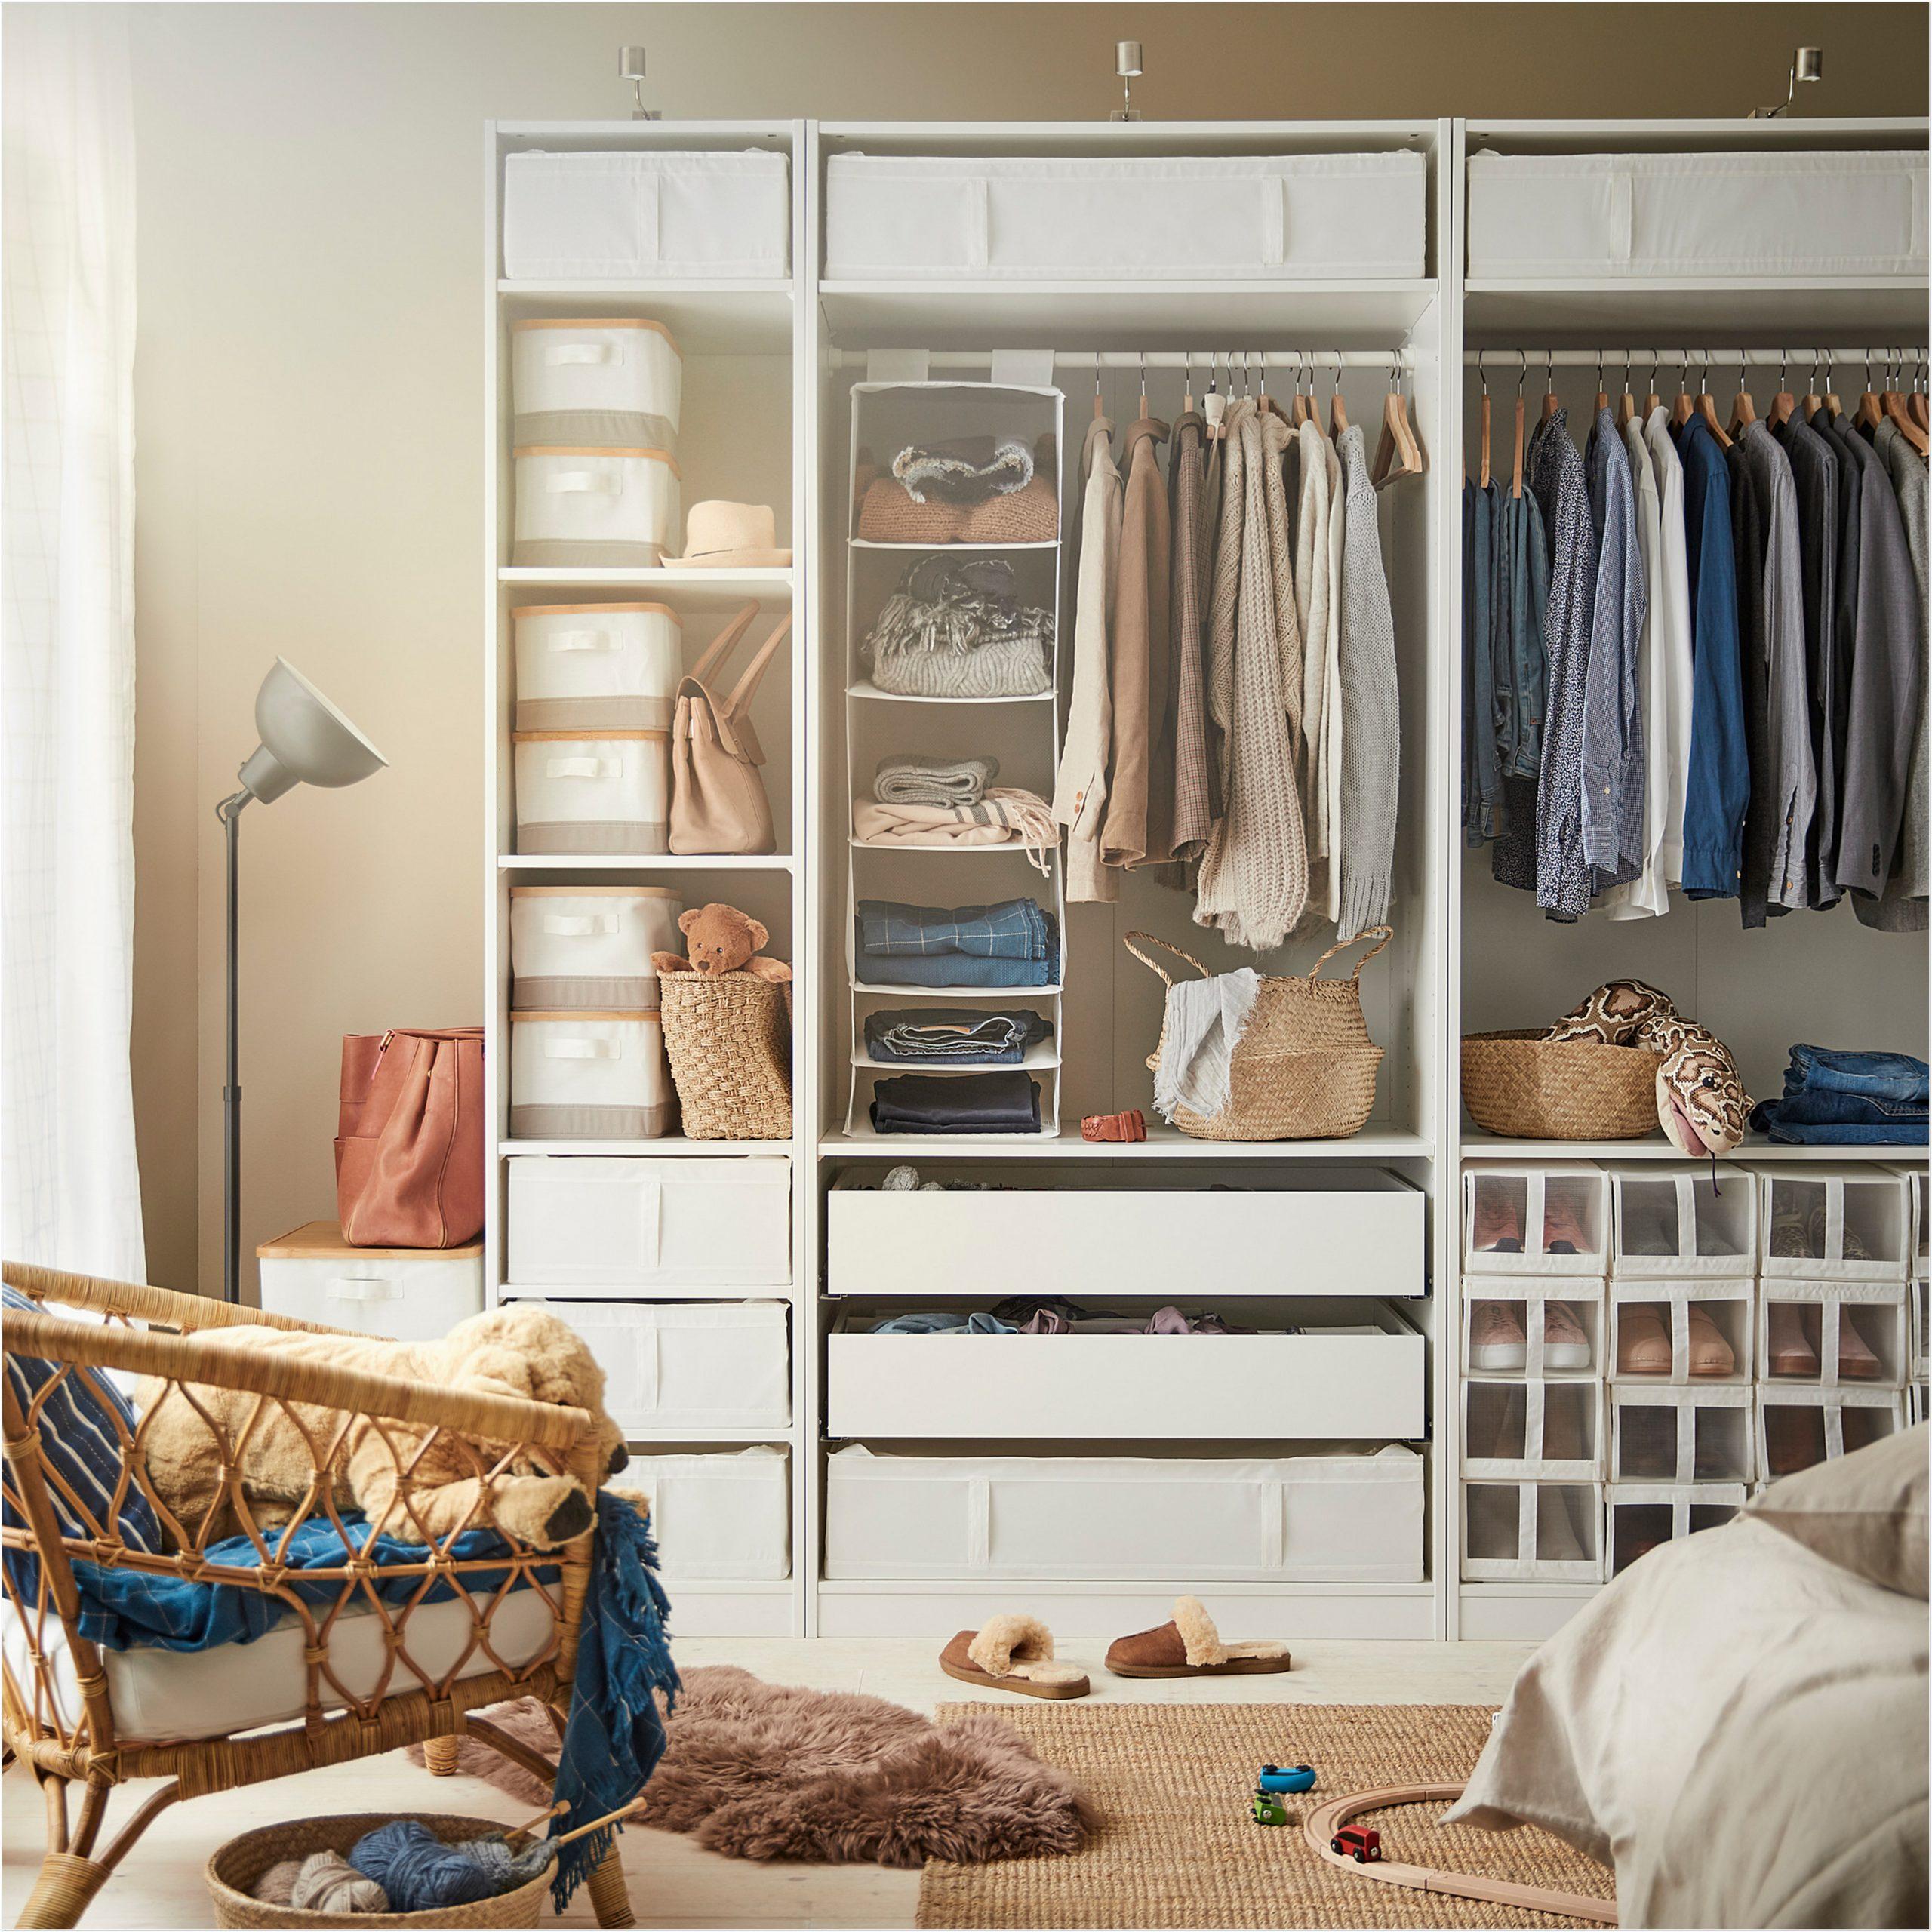 Small Clothes Closet Organization